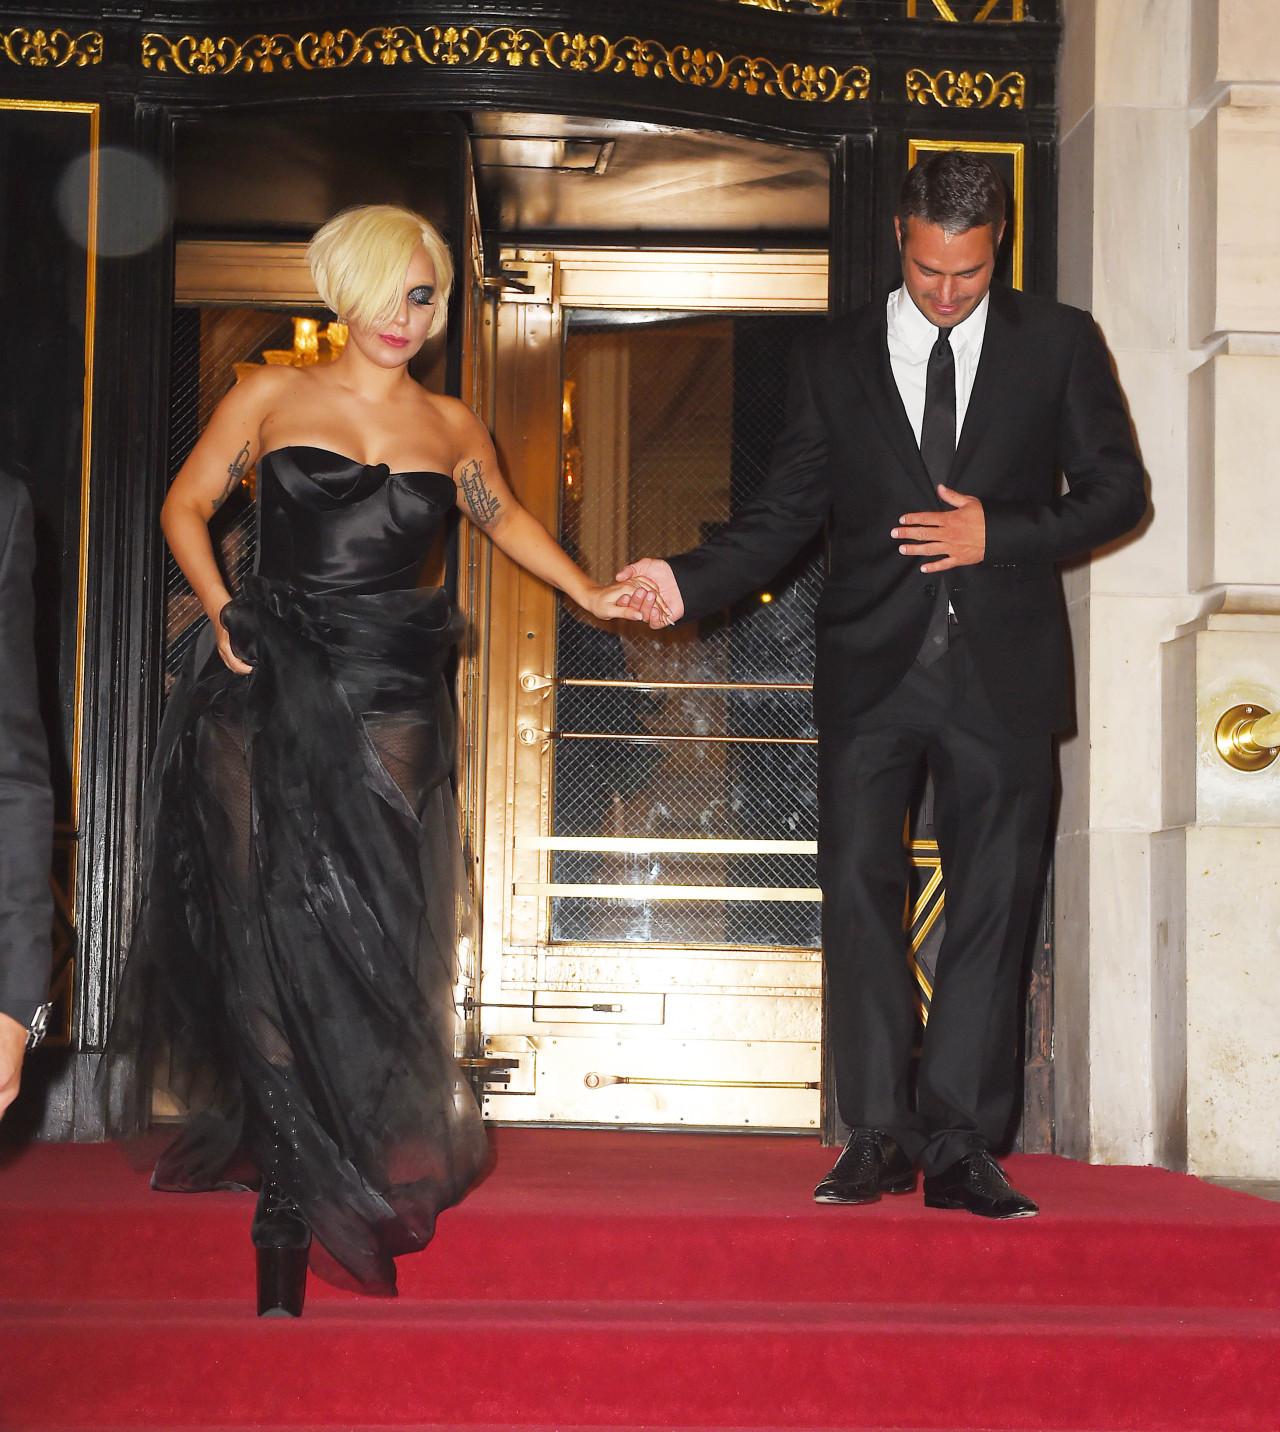 Lady Gaga and Taylor Kinney. - Page 2 Tumblr_nbhzfttufj1rz7rr7o5_1280